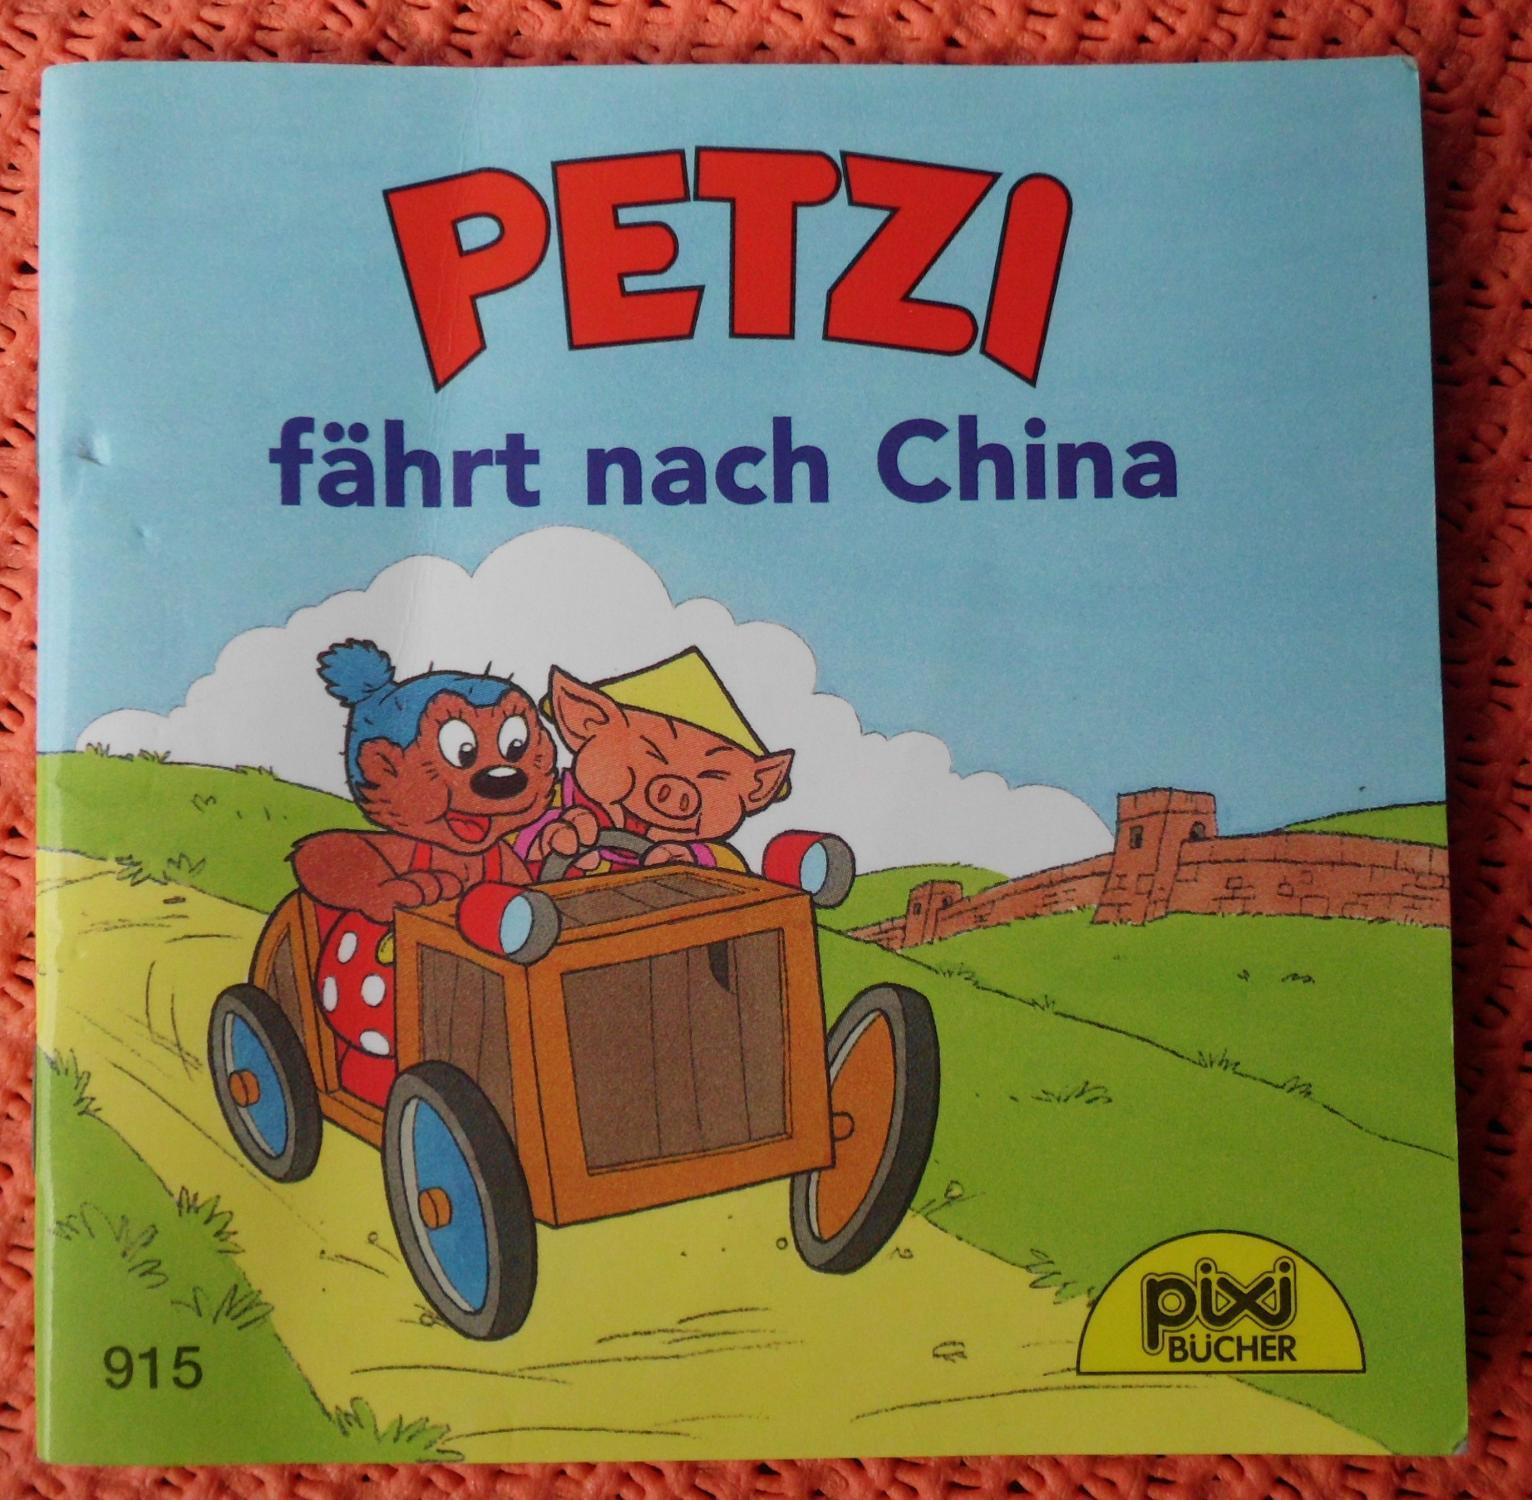 Petzi fährt nach China (Pixi Bücher)